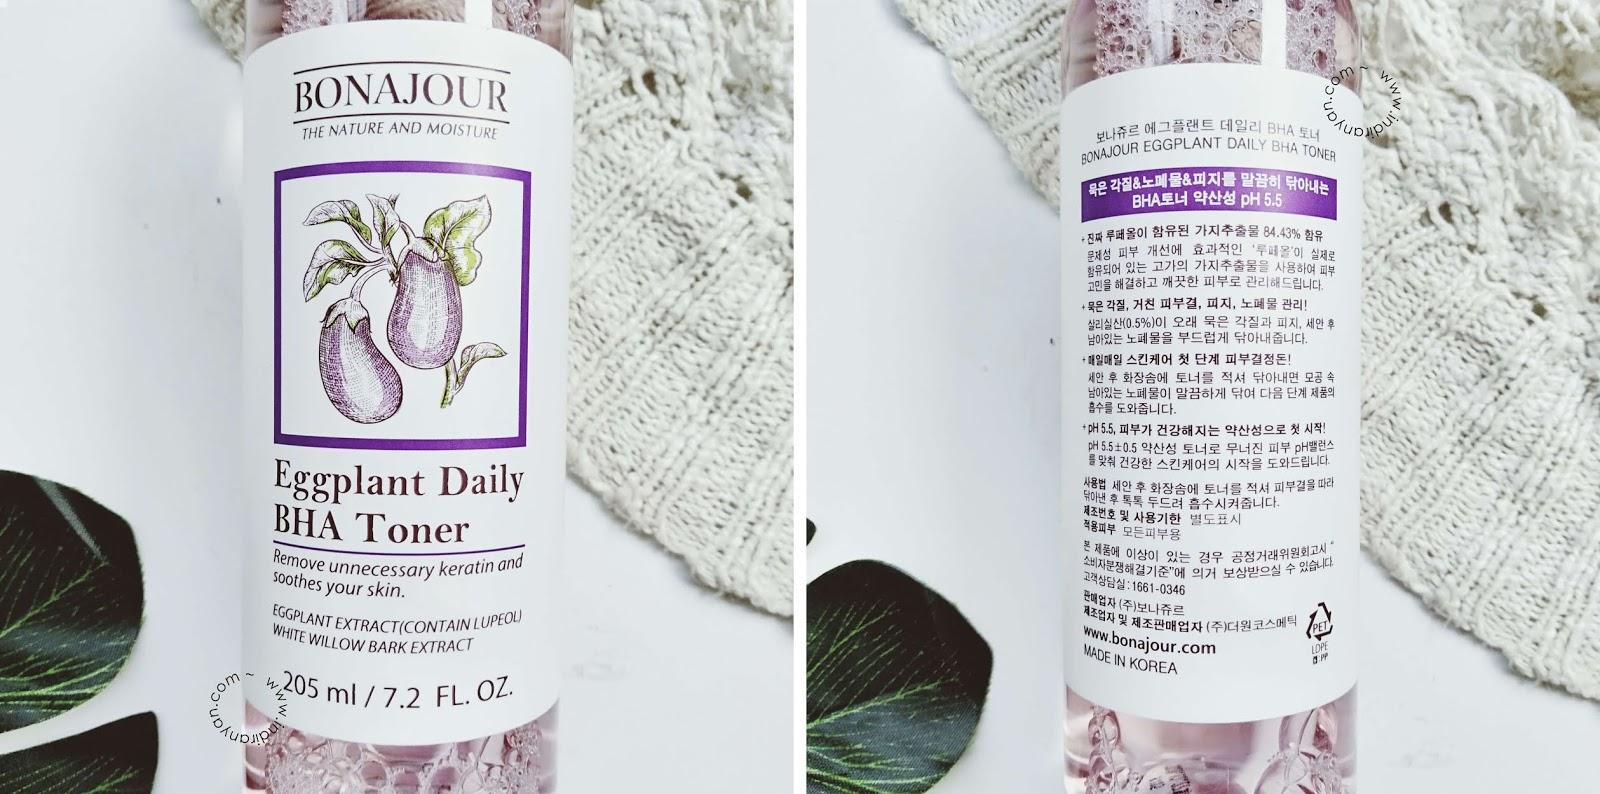 bonajour-eggplant-daily-bha-toner